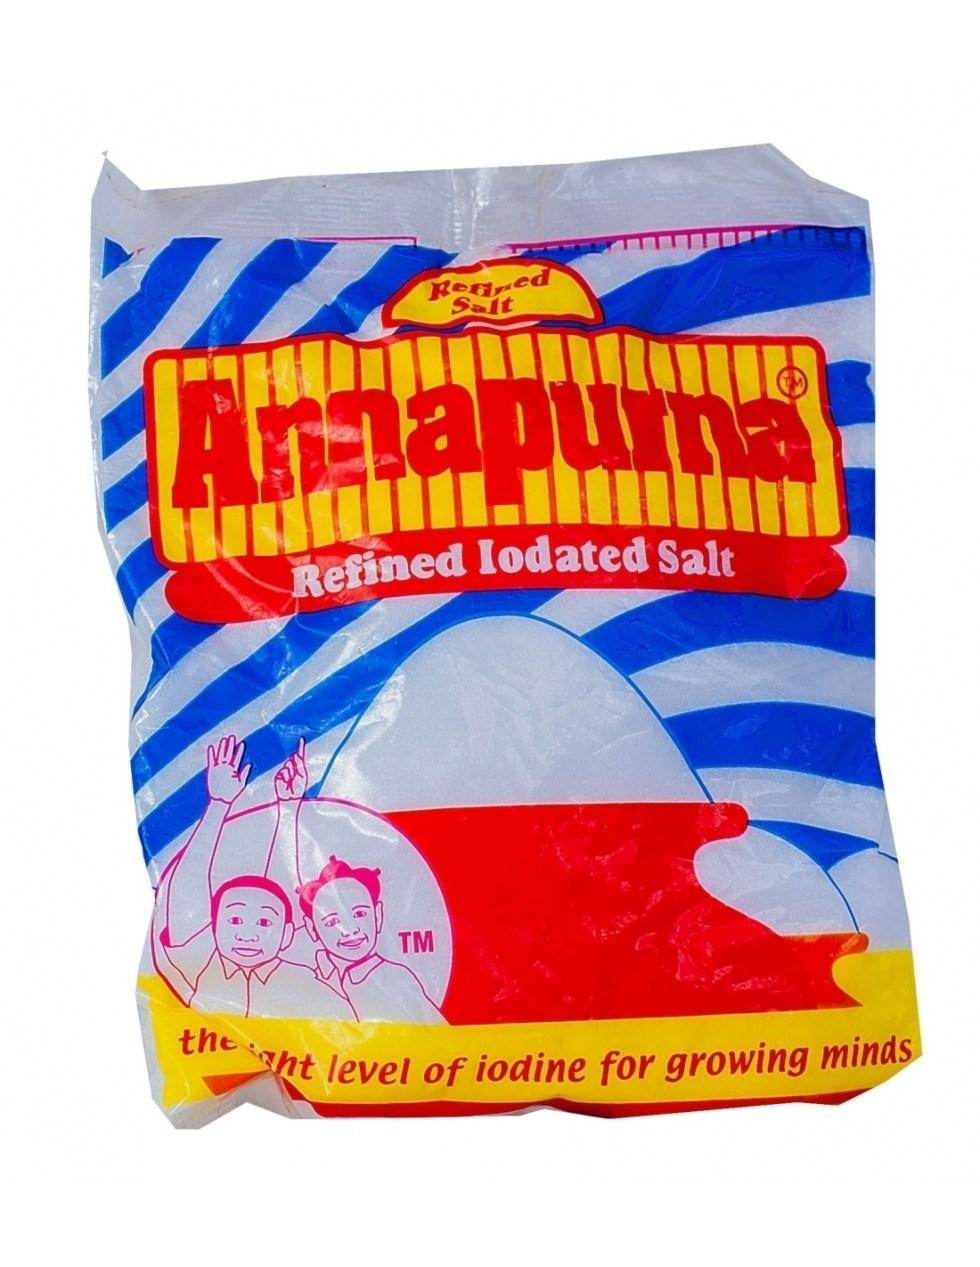 Annapurna Refined Iodated Salt